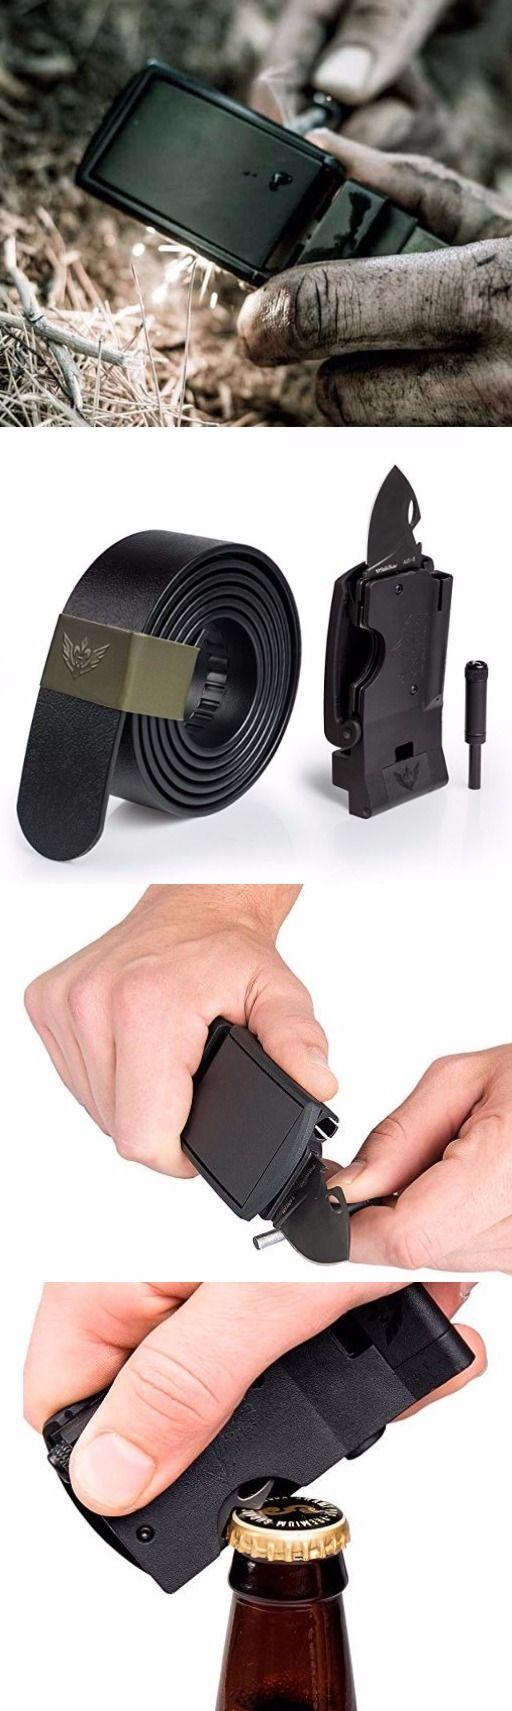 Survival Ratchet Belt EDC Everyday Carry Survival Gear @thistookmymoney